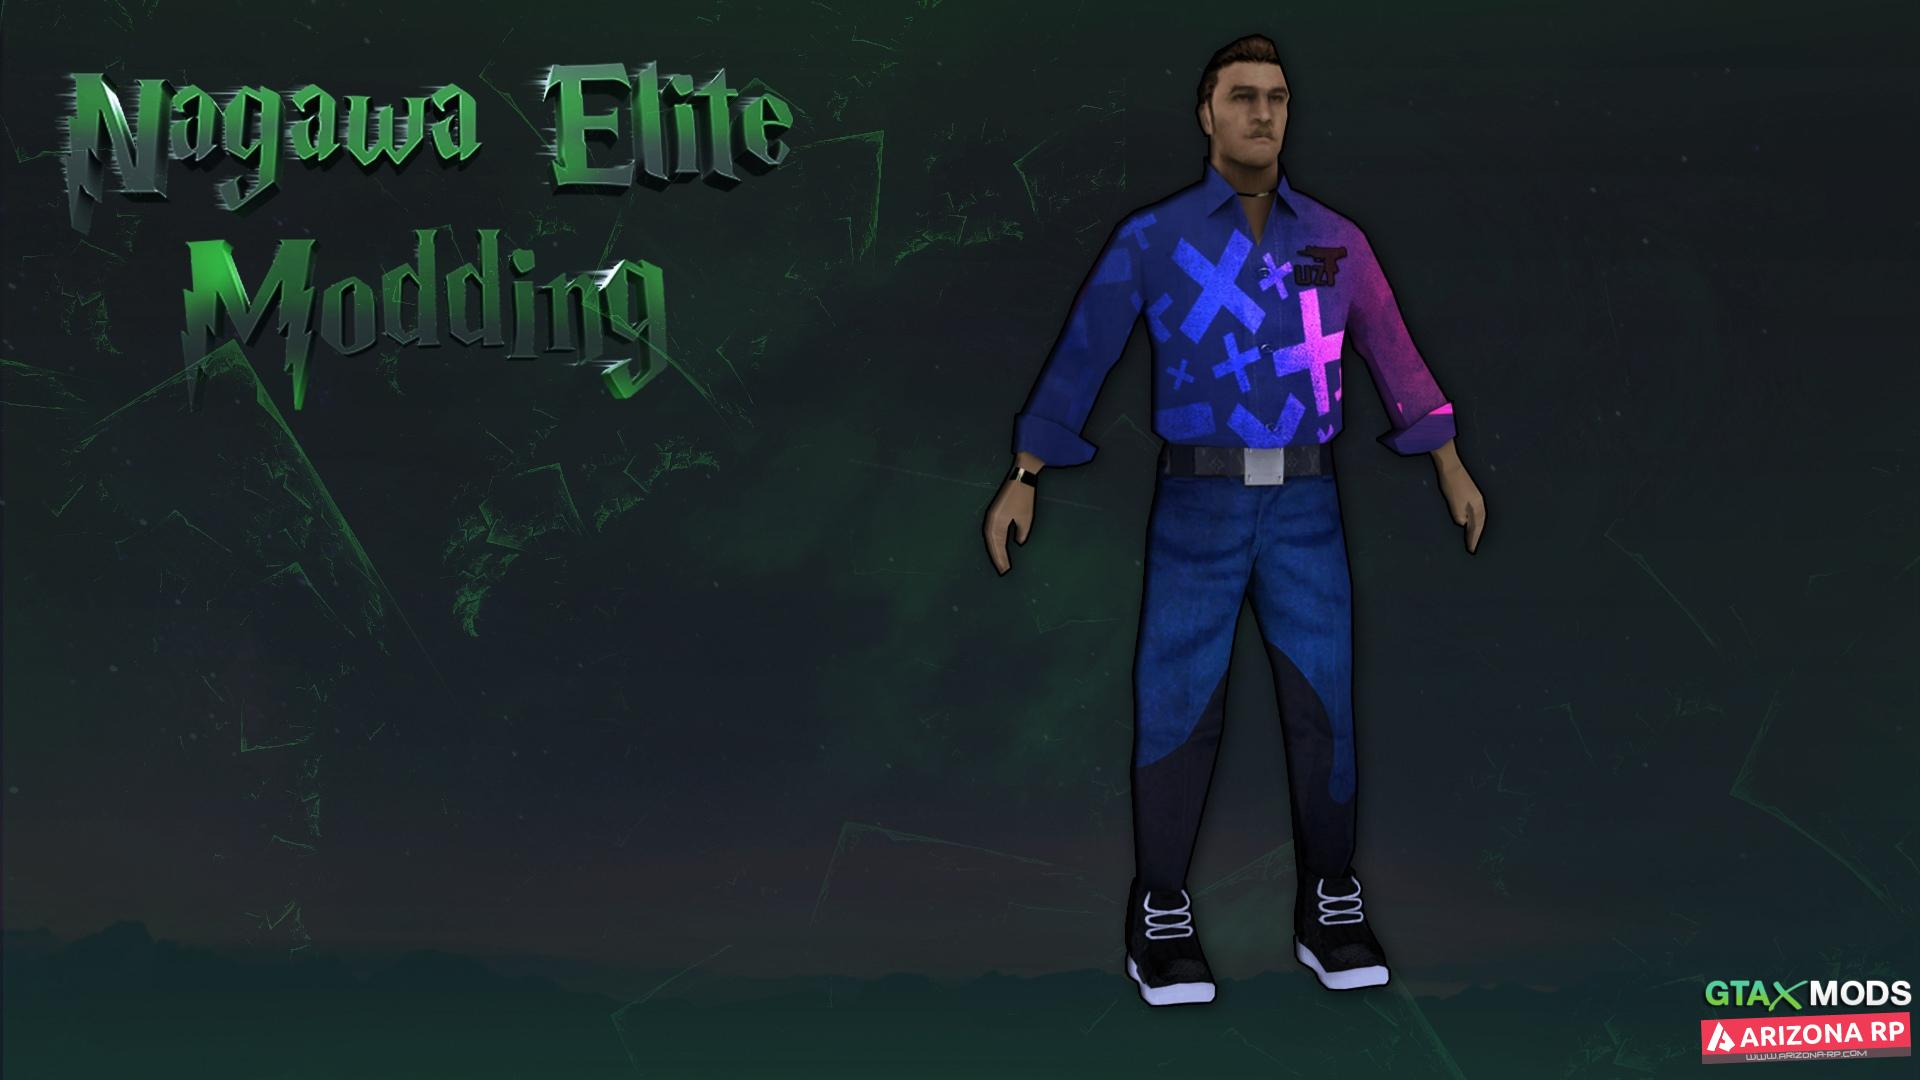 shmycr / Nagawa Elite Modding